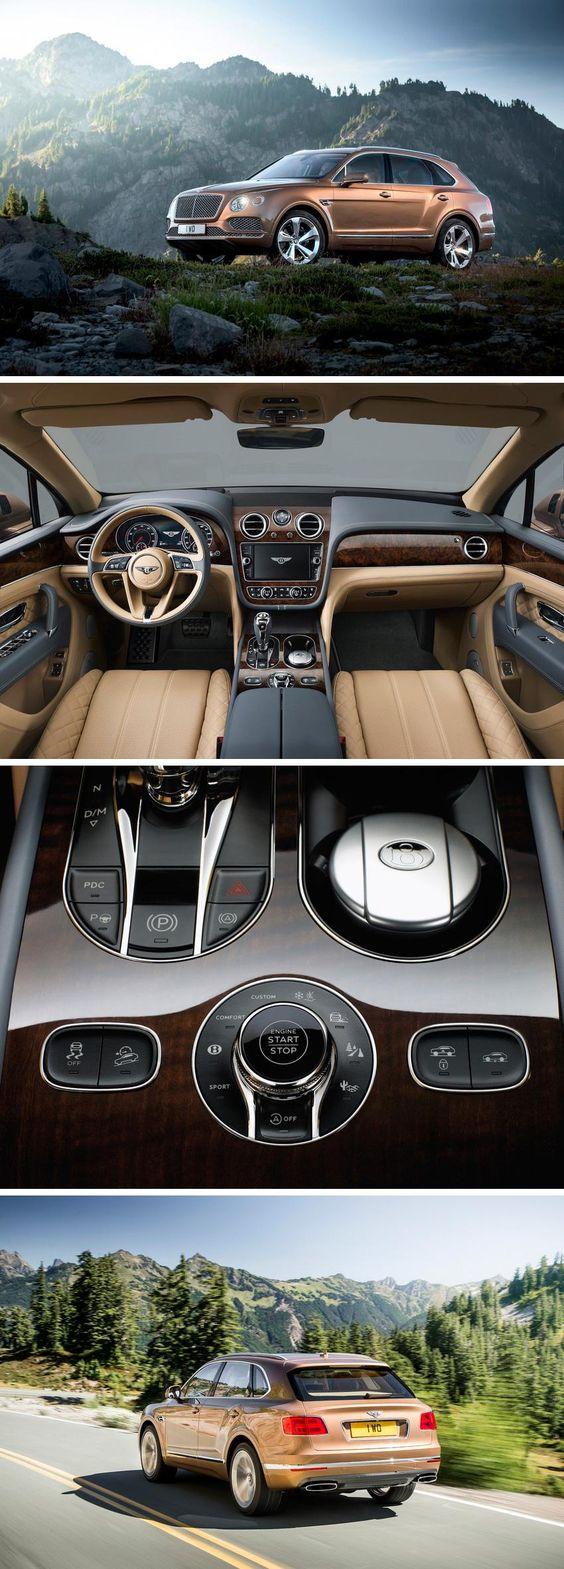 The Bentley Bentayga SUV is a fast, luxurious, tech-savvy SUV